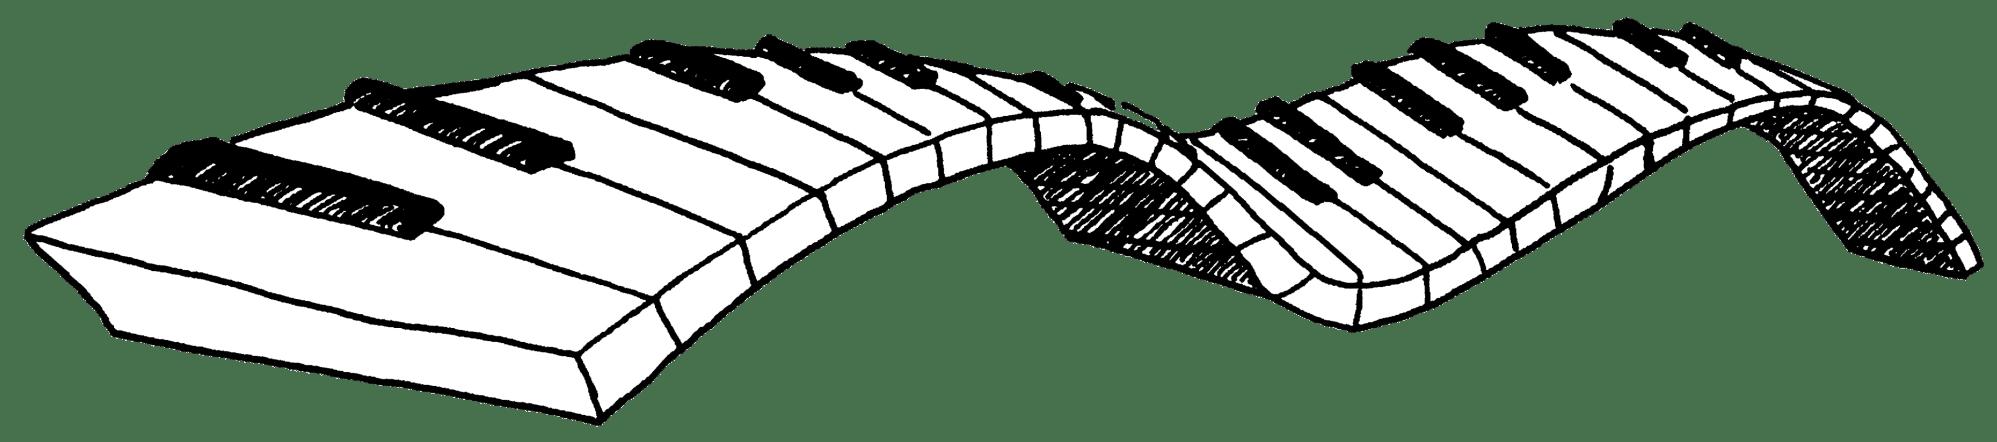 hight resolution of piano keys clipart